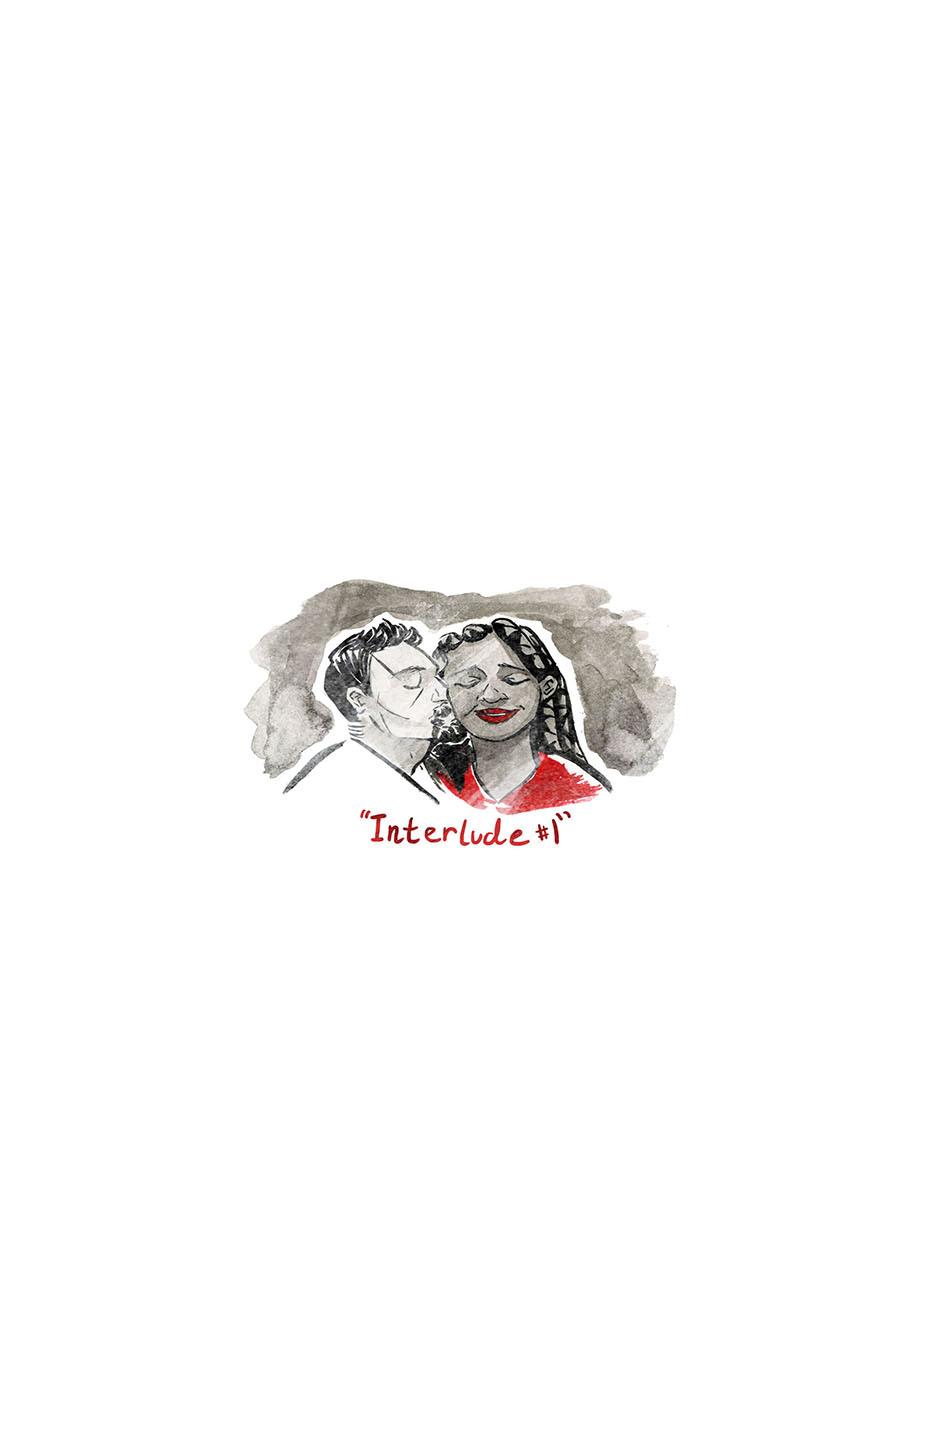 Interlude #1: Kiss